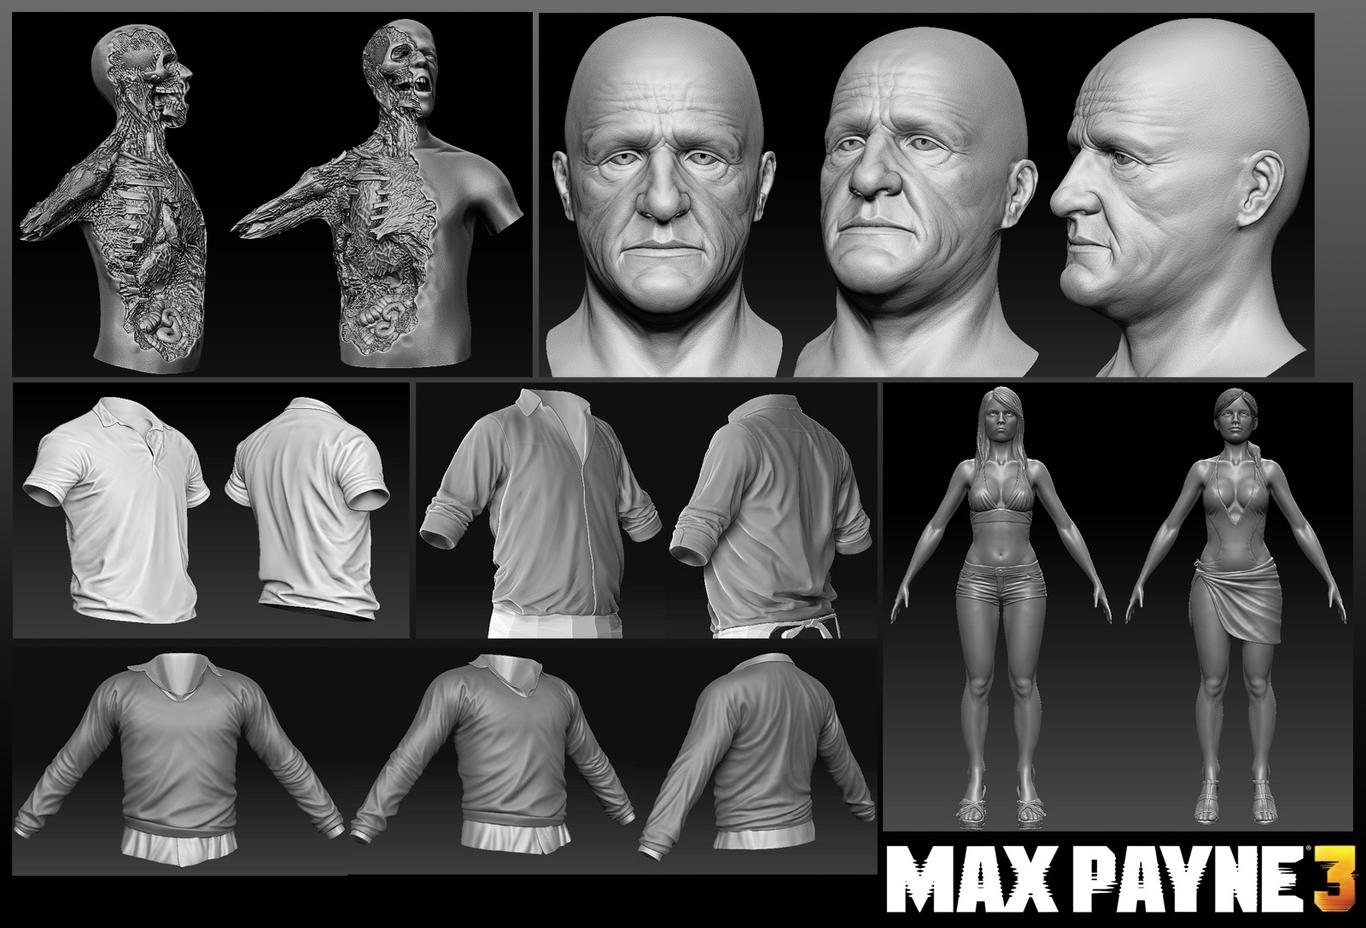 max payne 3 concept art